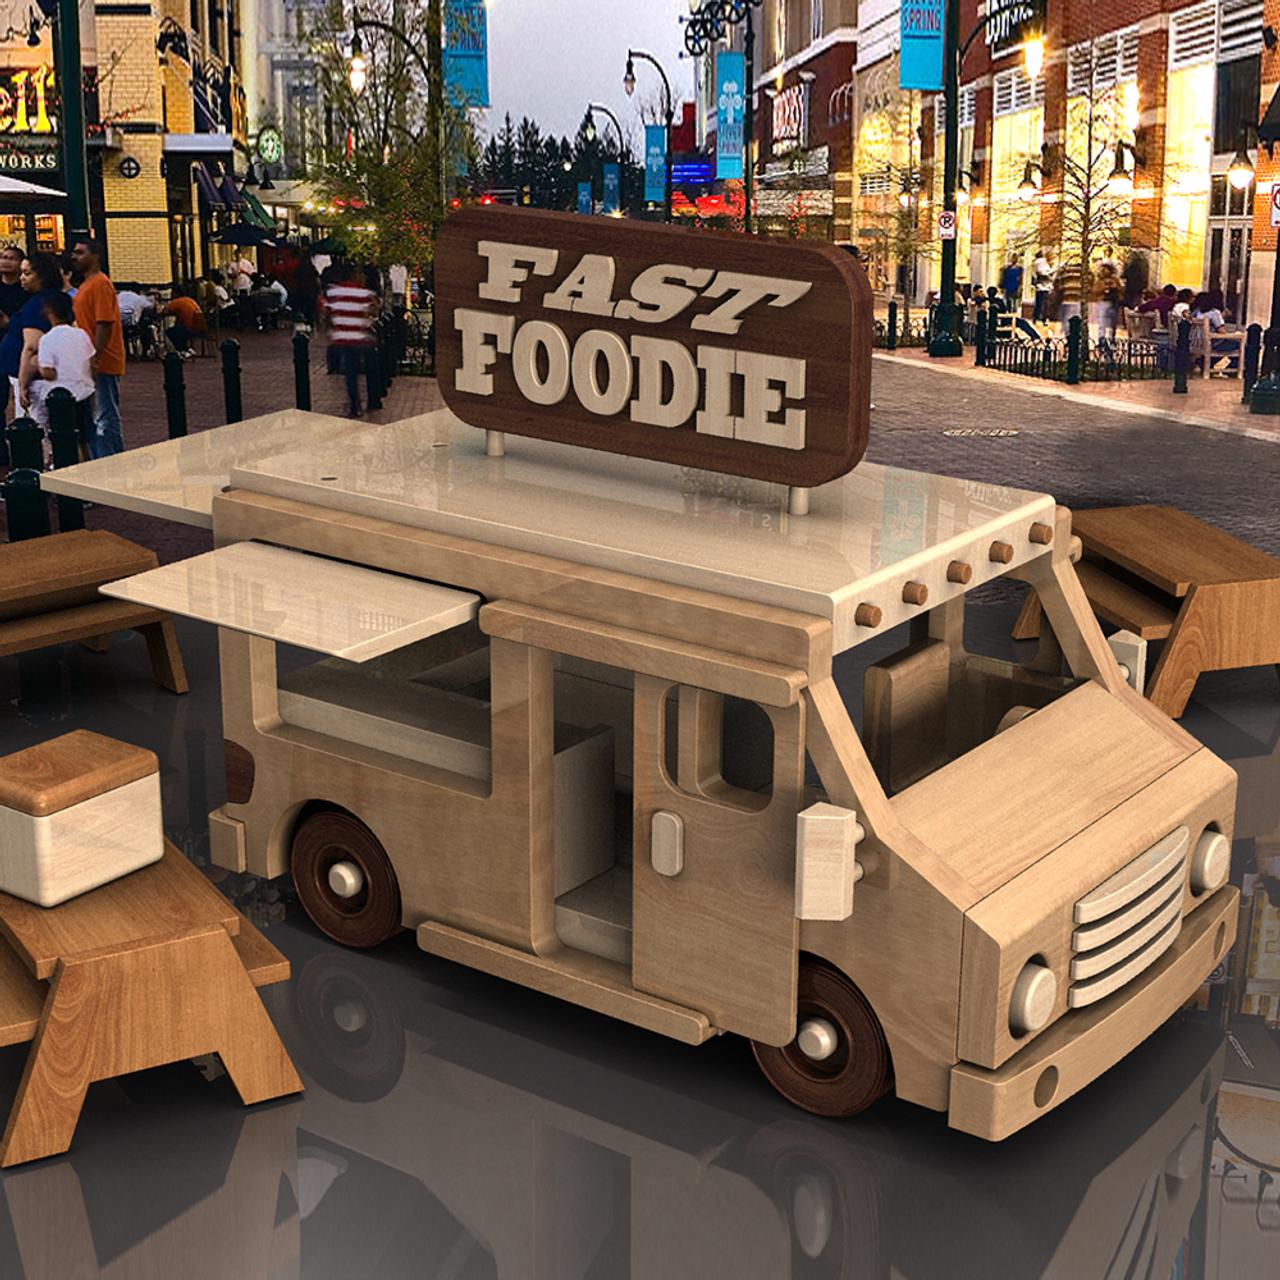 fast foodie n delivery trucks wood toy plans (2 pdf downloads)